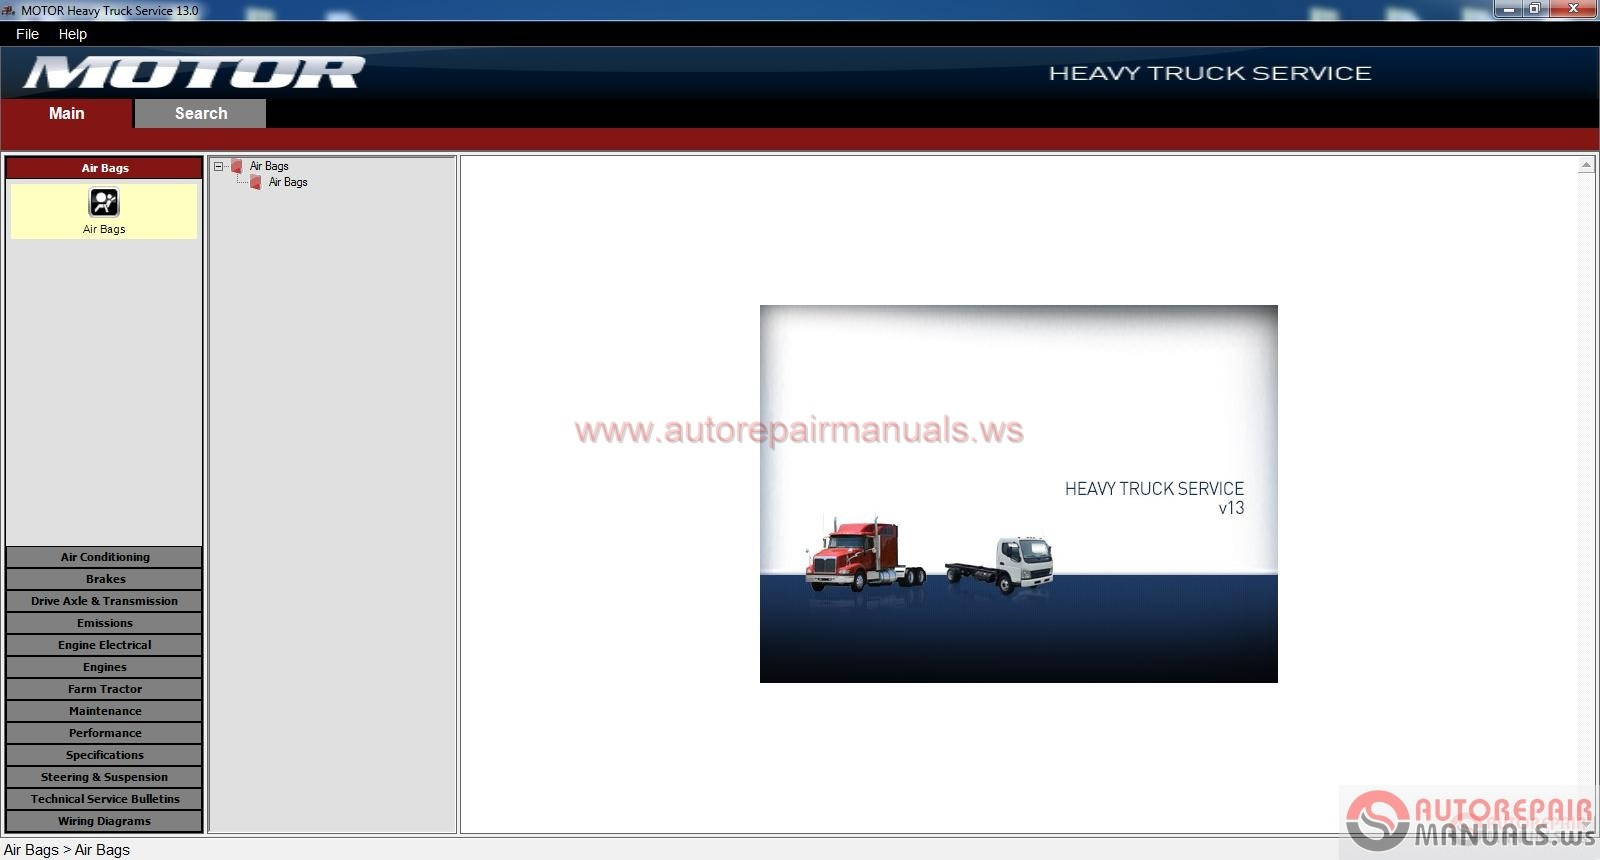 Sensational Chevy Truck Repair Manuals Online Free Wiring Cloud Hisonepsysticxongrecoveryedborg